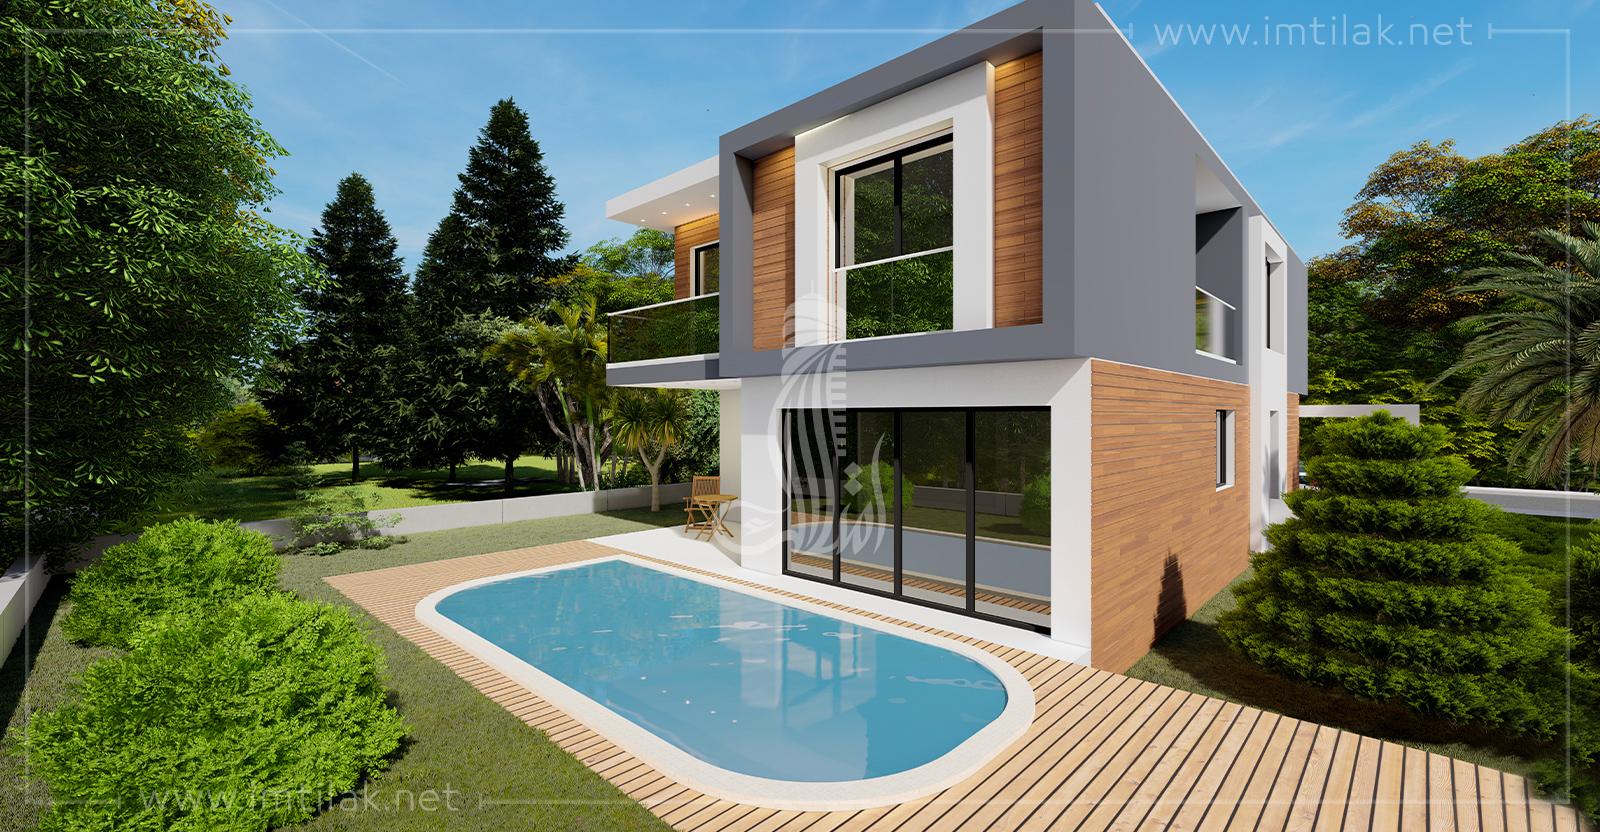 IMT -759  Résidence Villas de Feriz